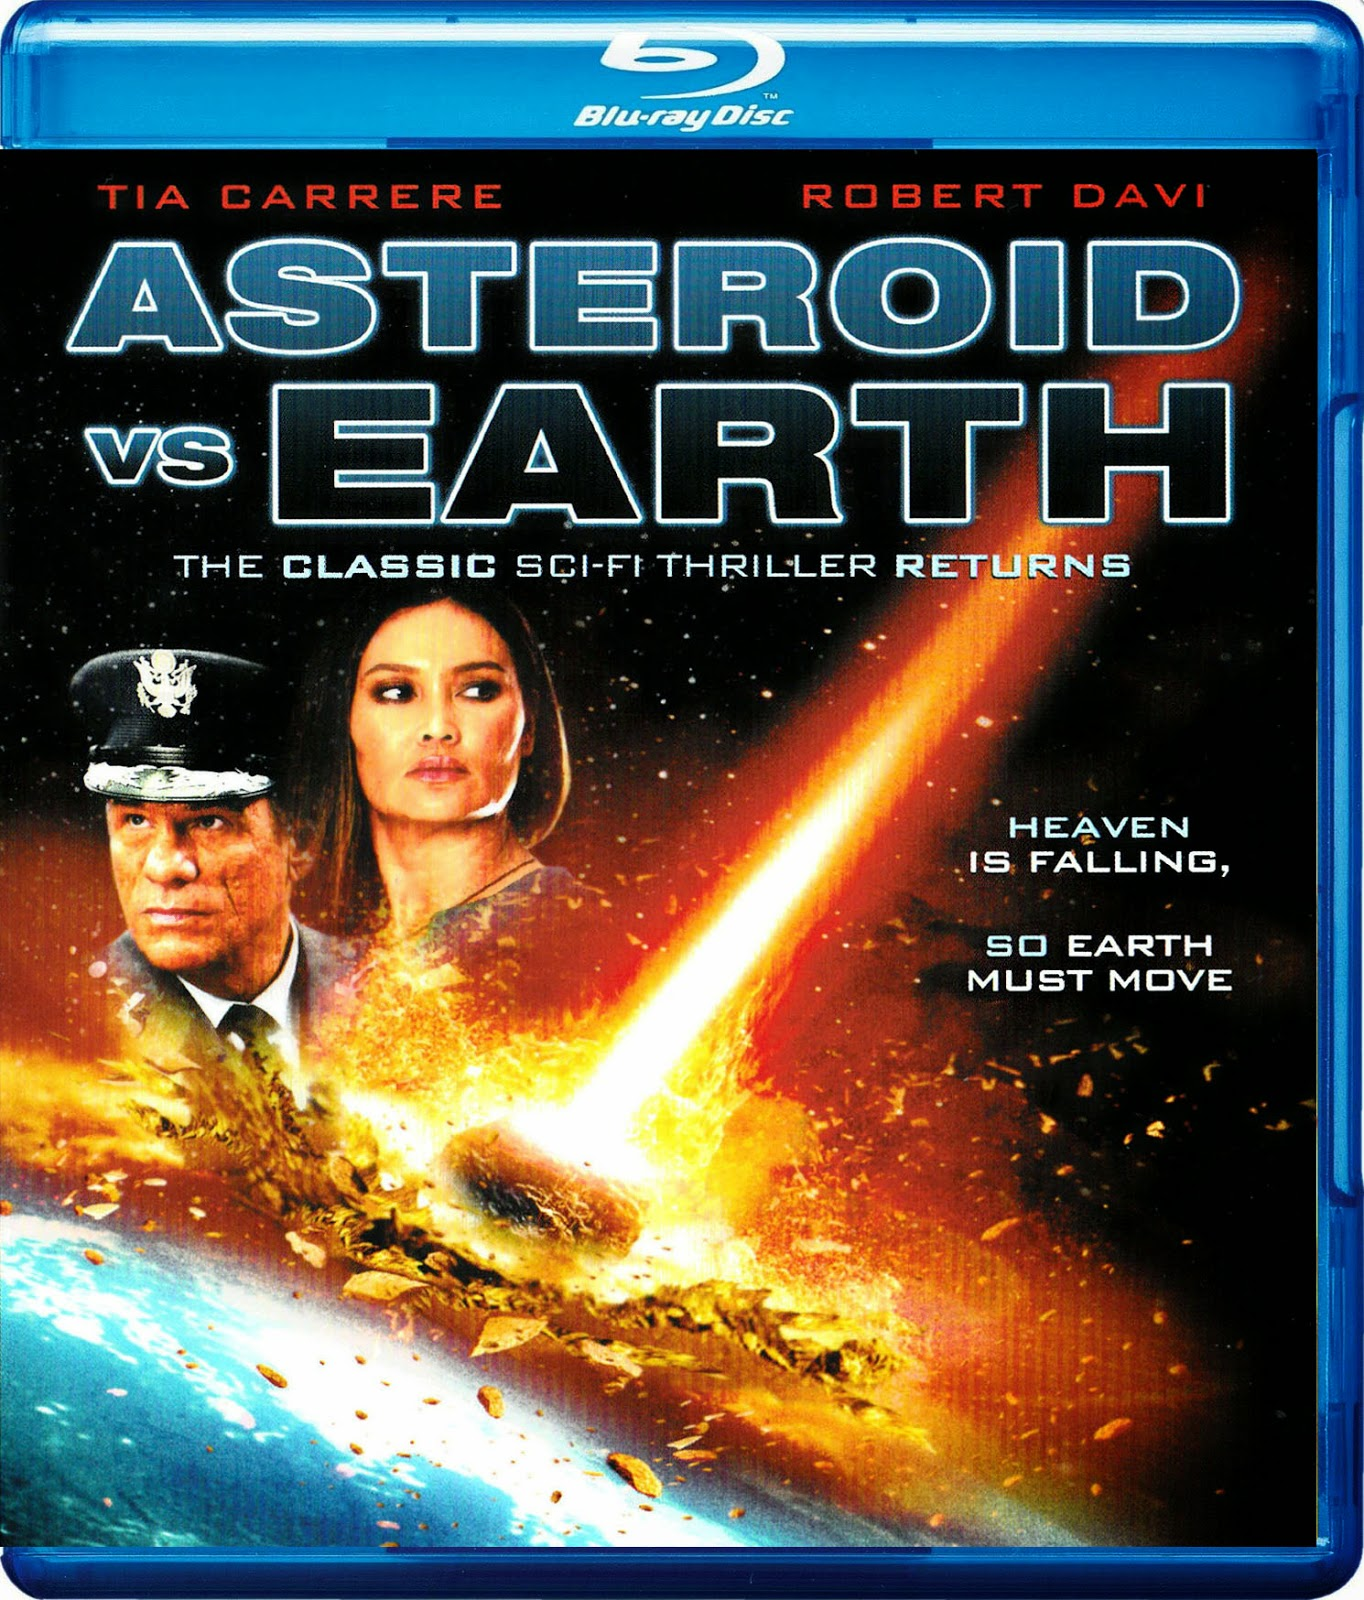 asteroid vs earth dvd - photo #1